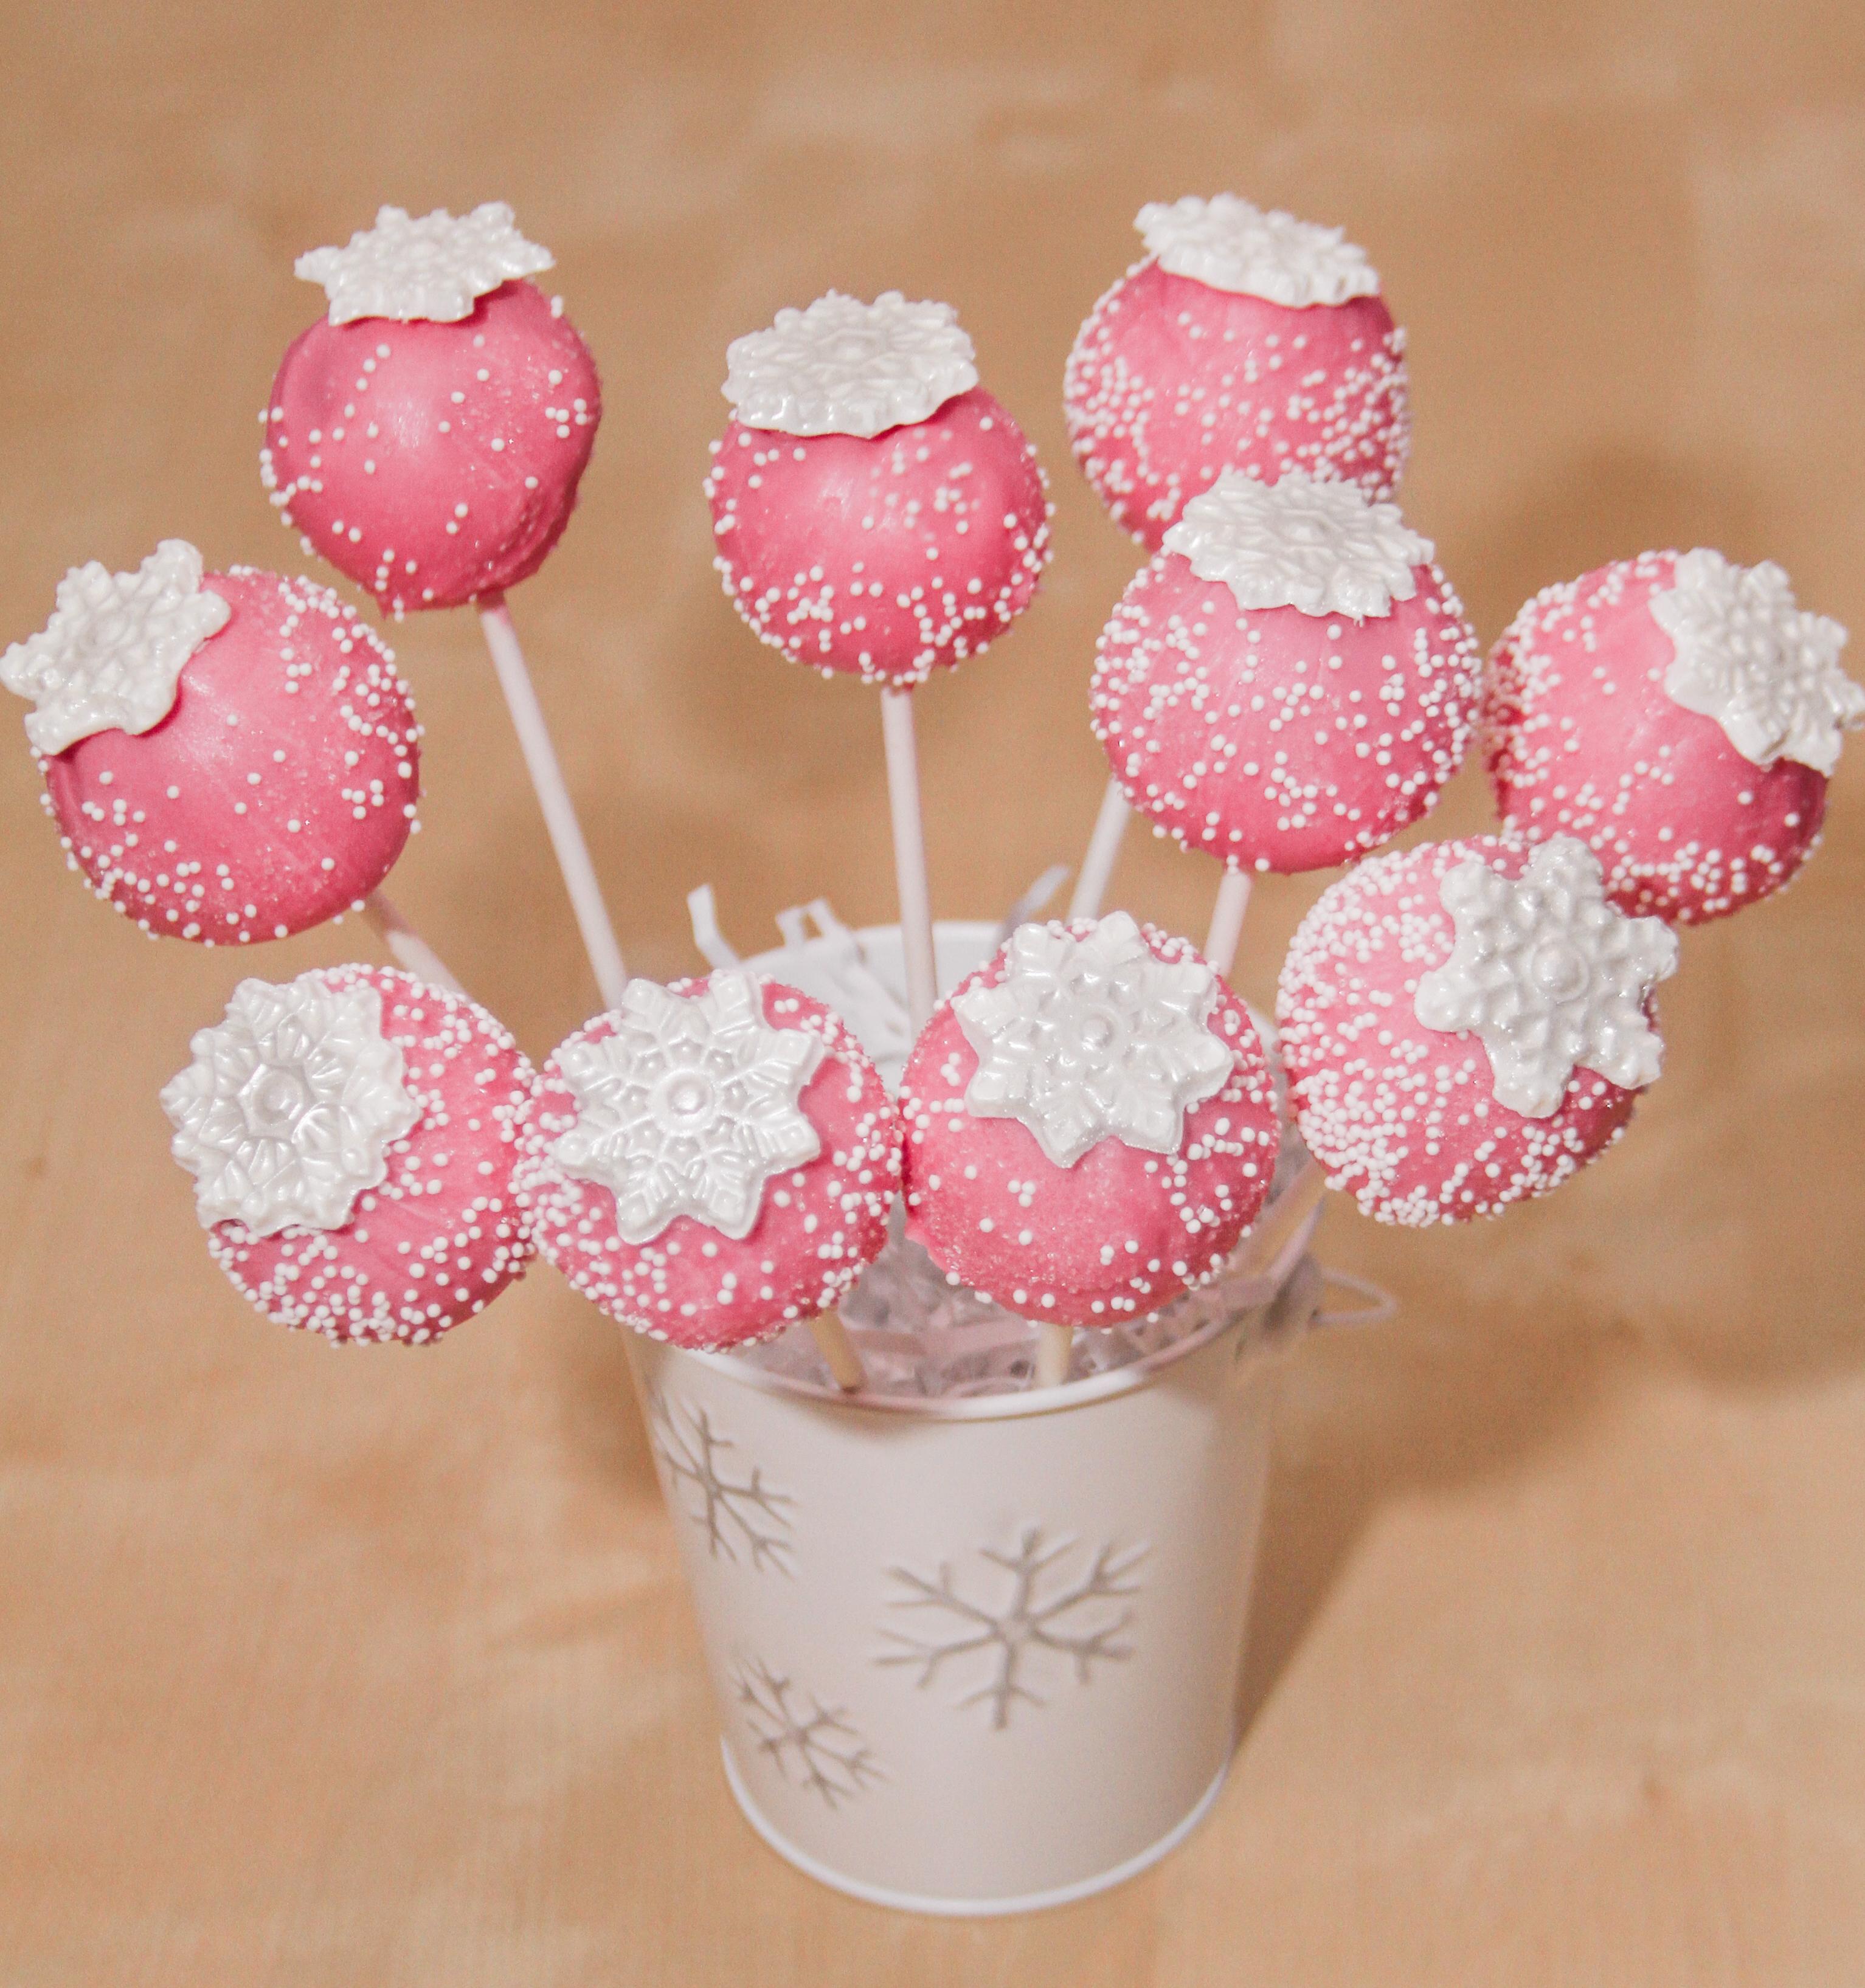 Snowflake Cake Pops $3